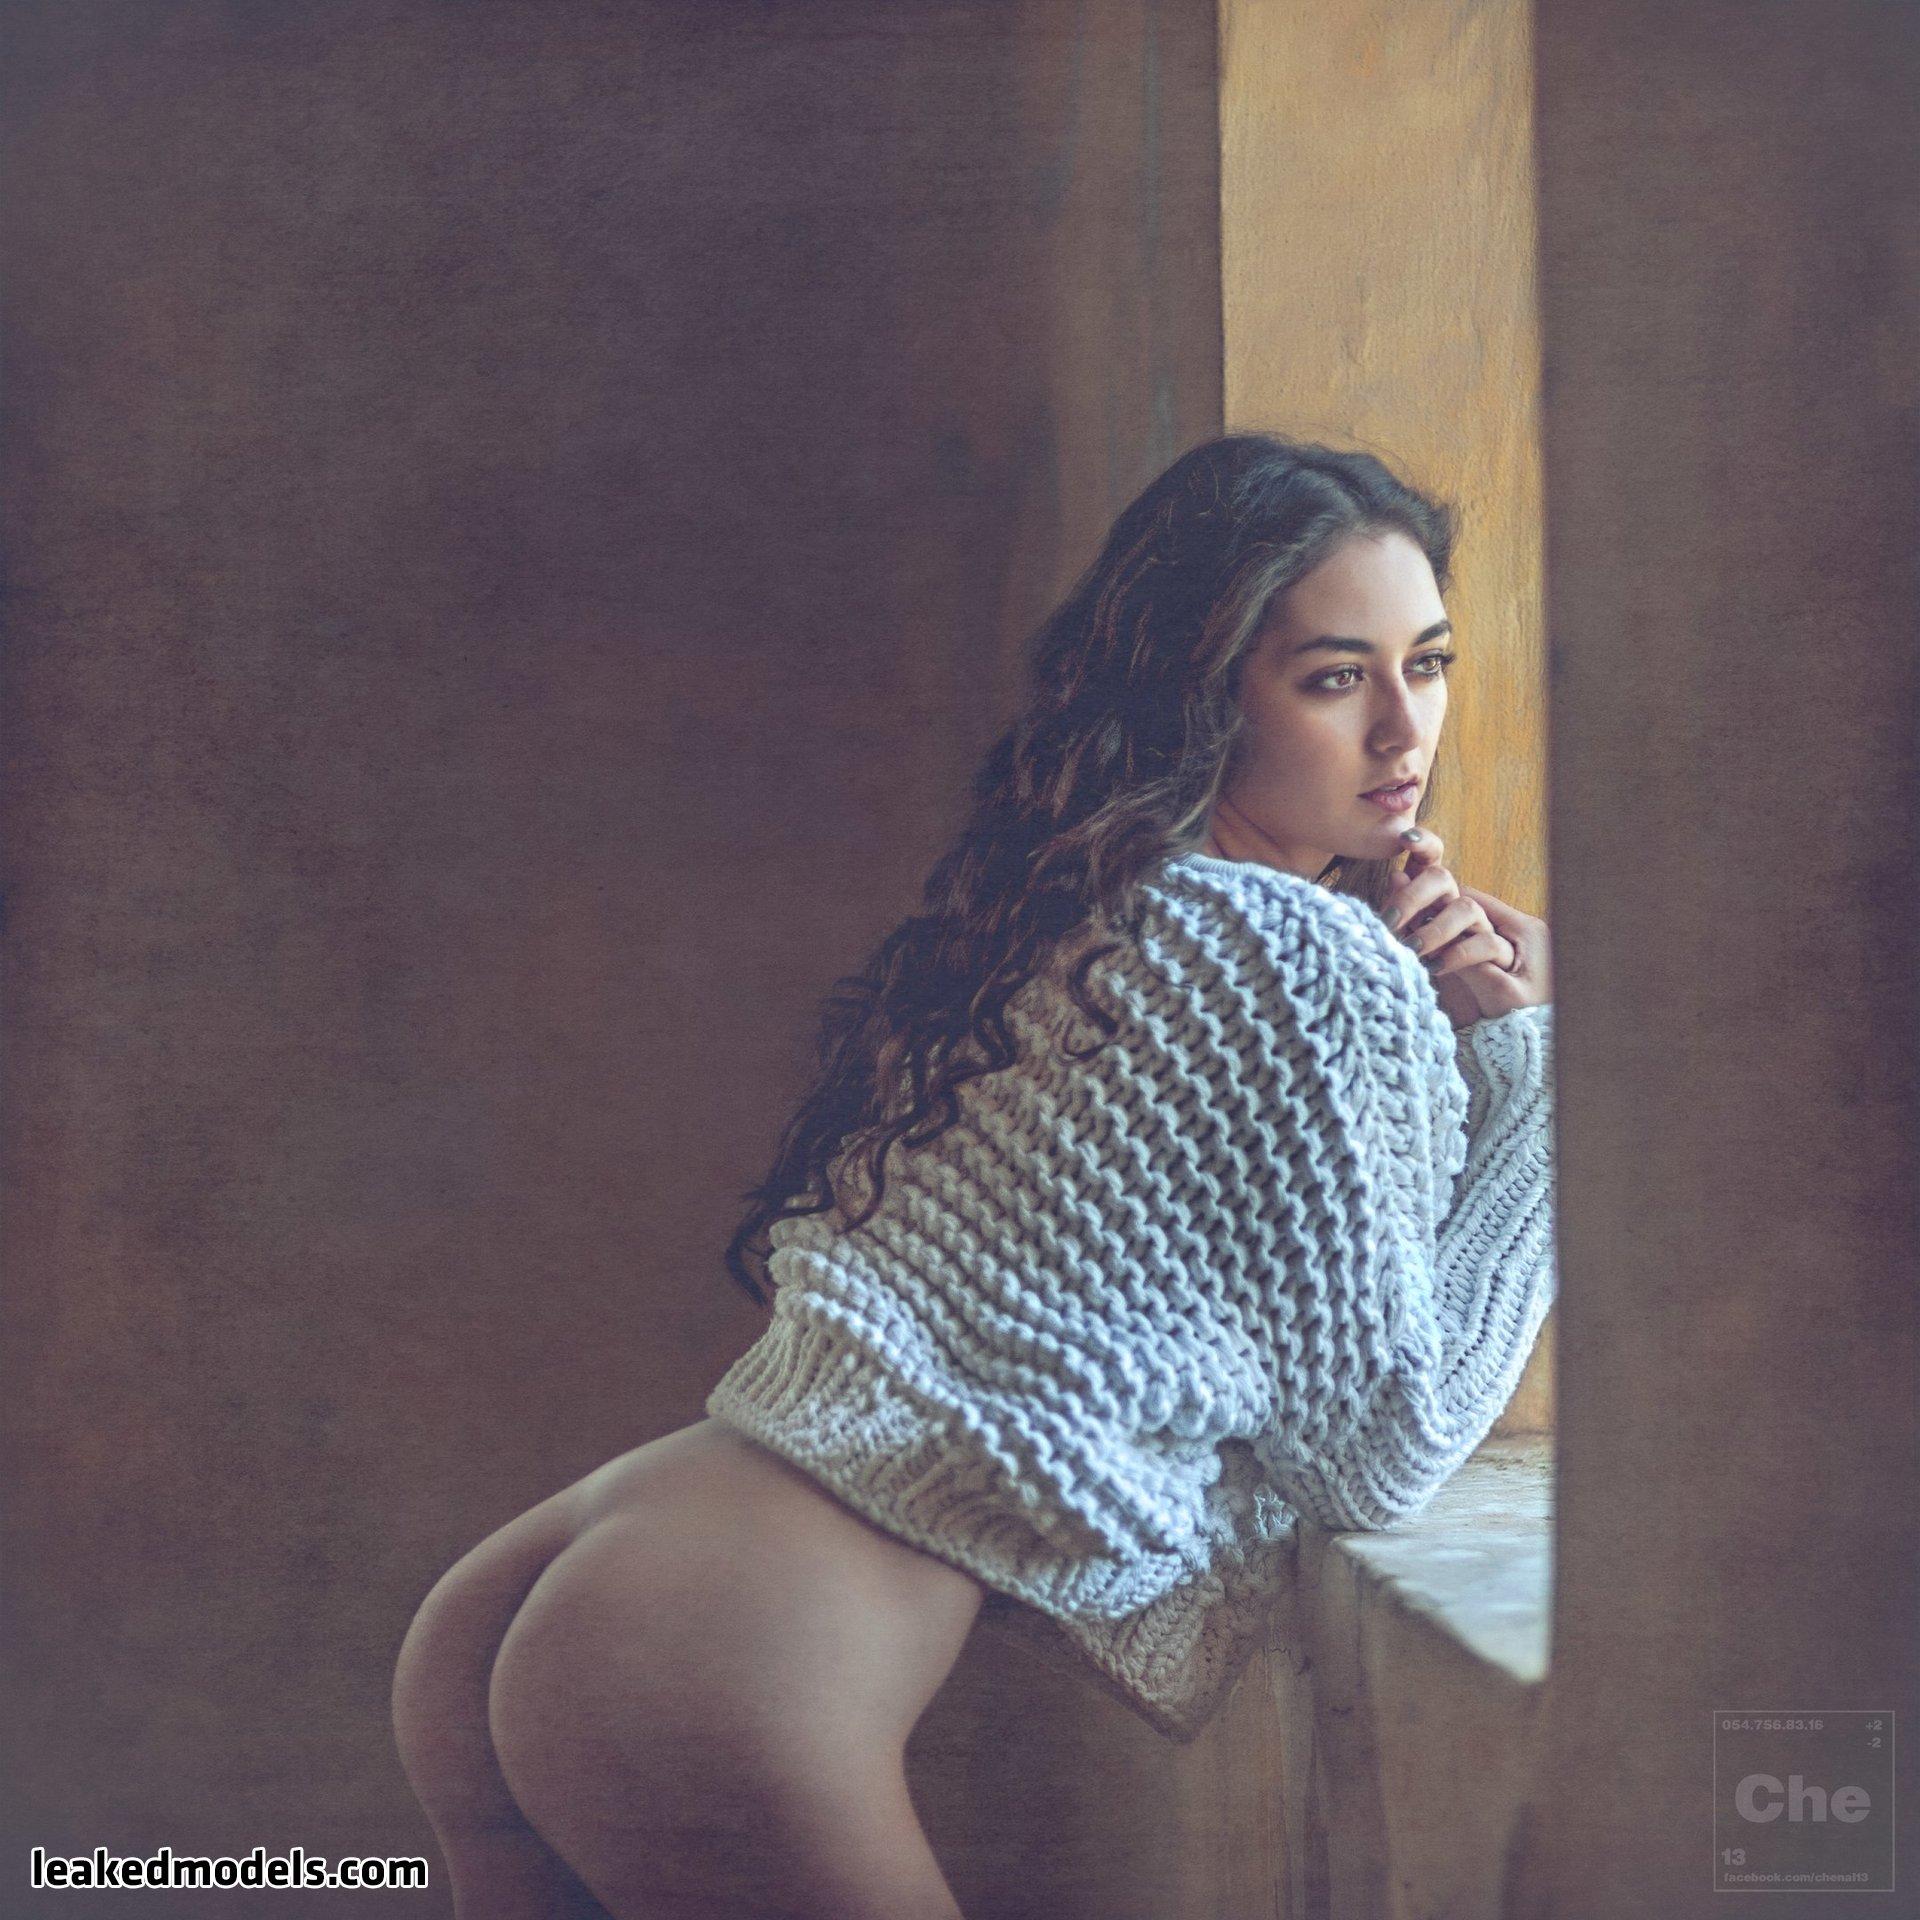 Diana Leitman Instagram Nude Leaks (17 Photos)